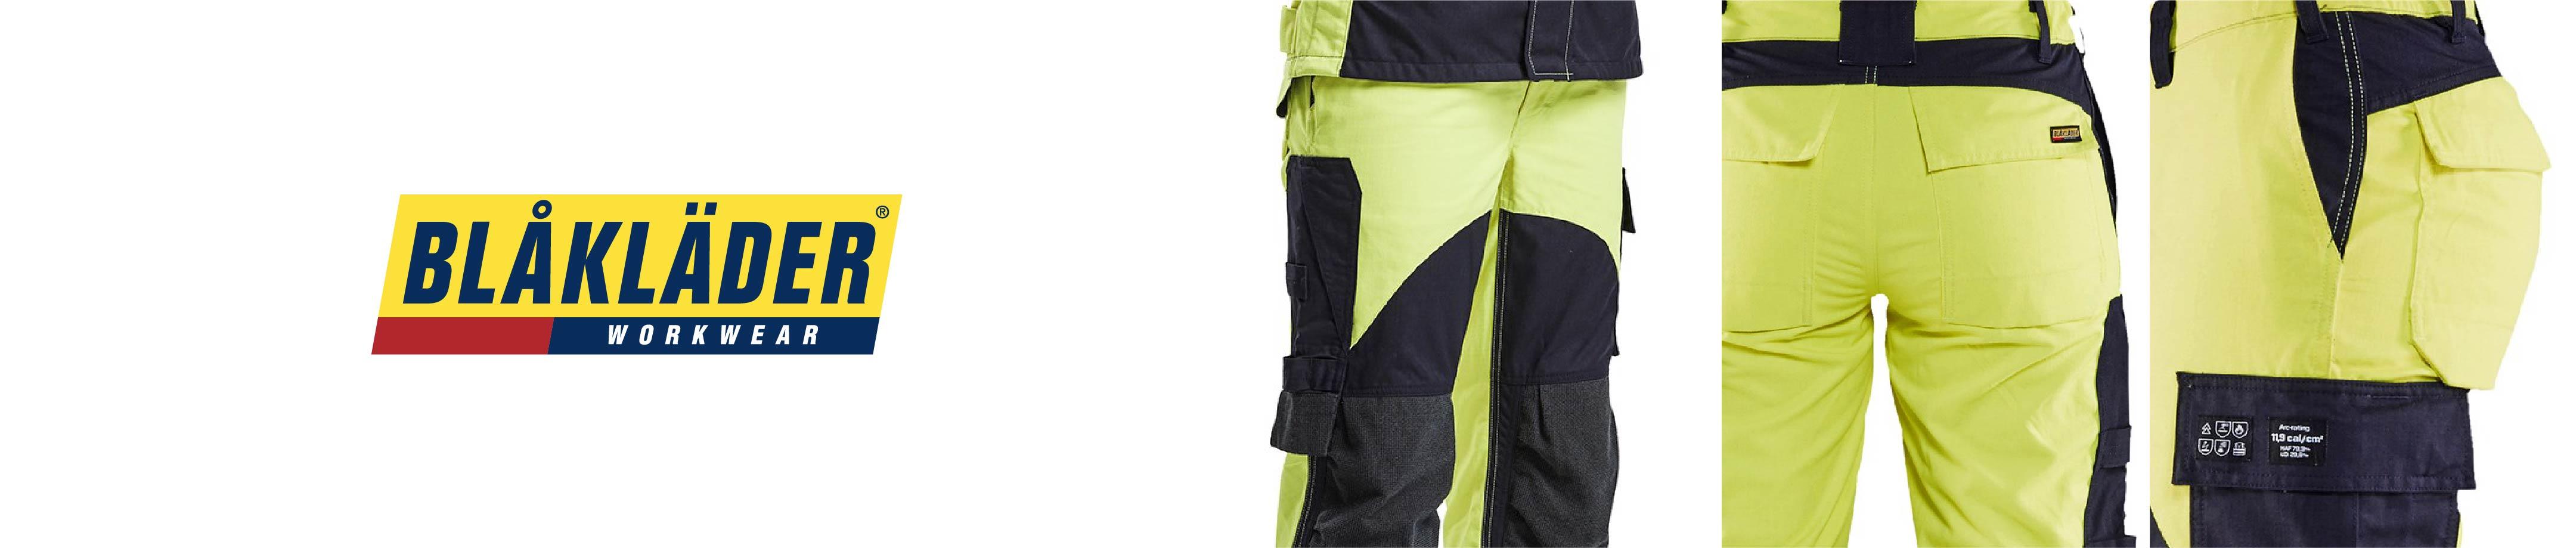 Flame retardant work trousers